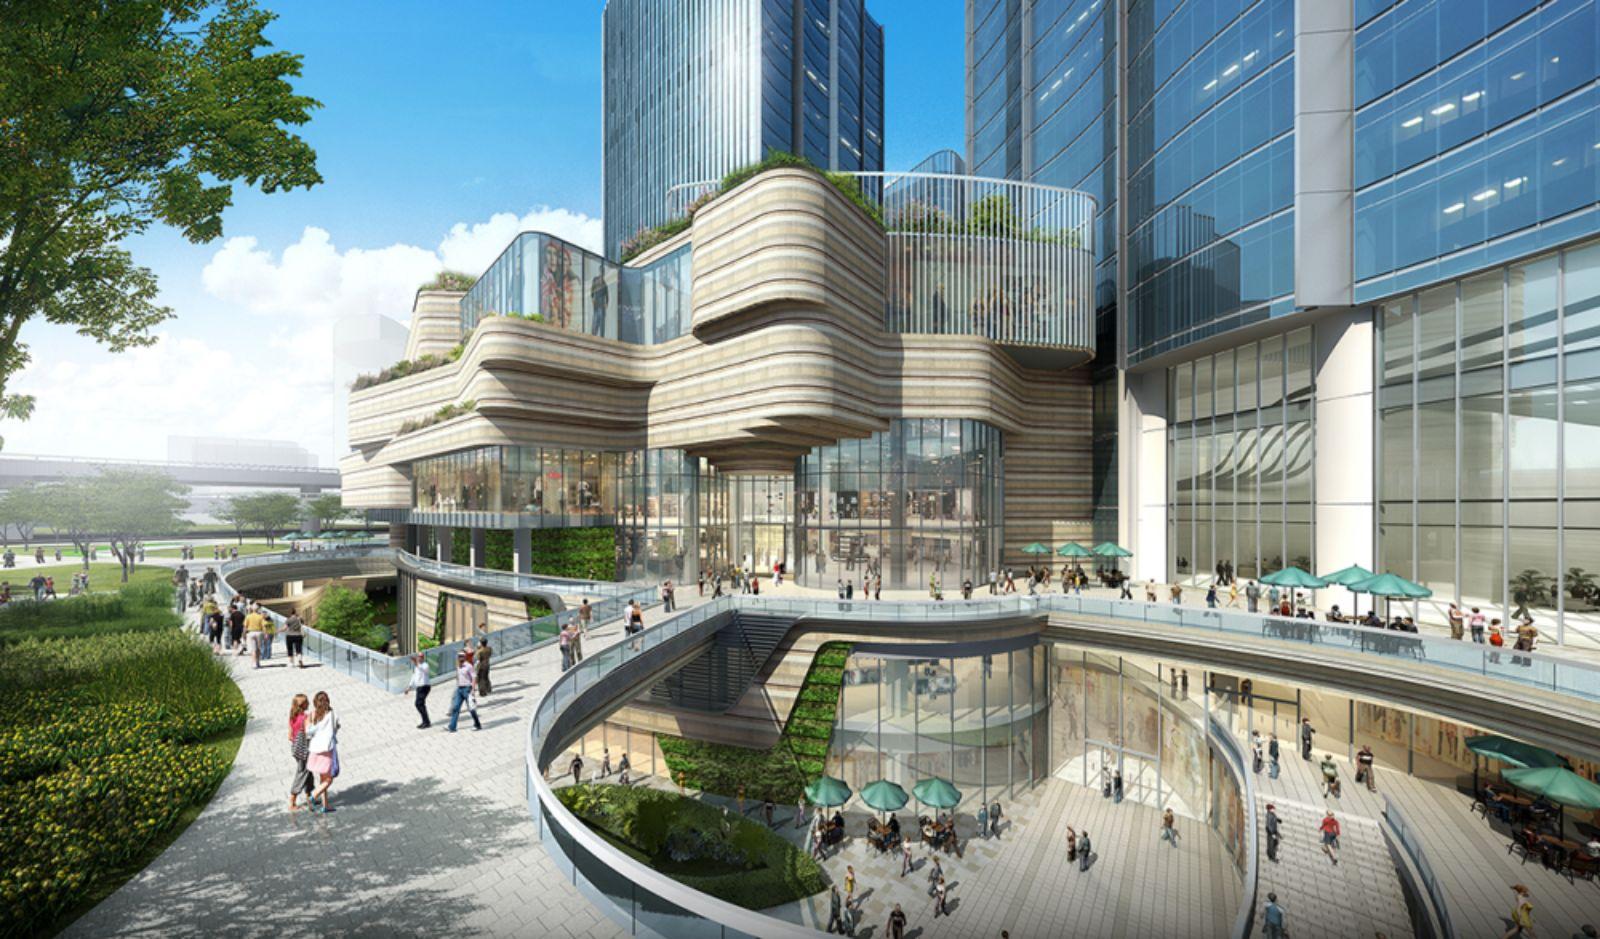 Xuhui Vanke Center in Shanghai